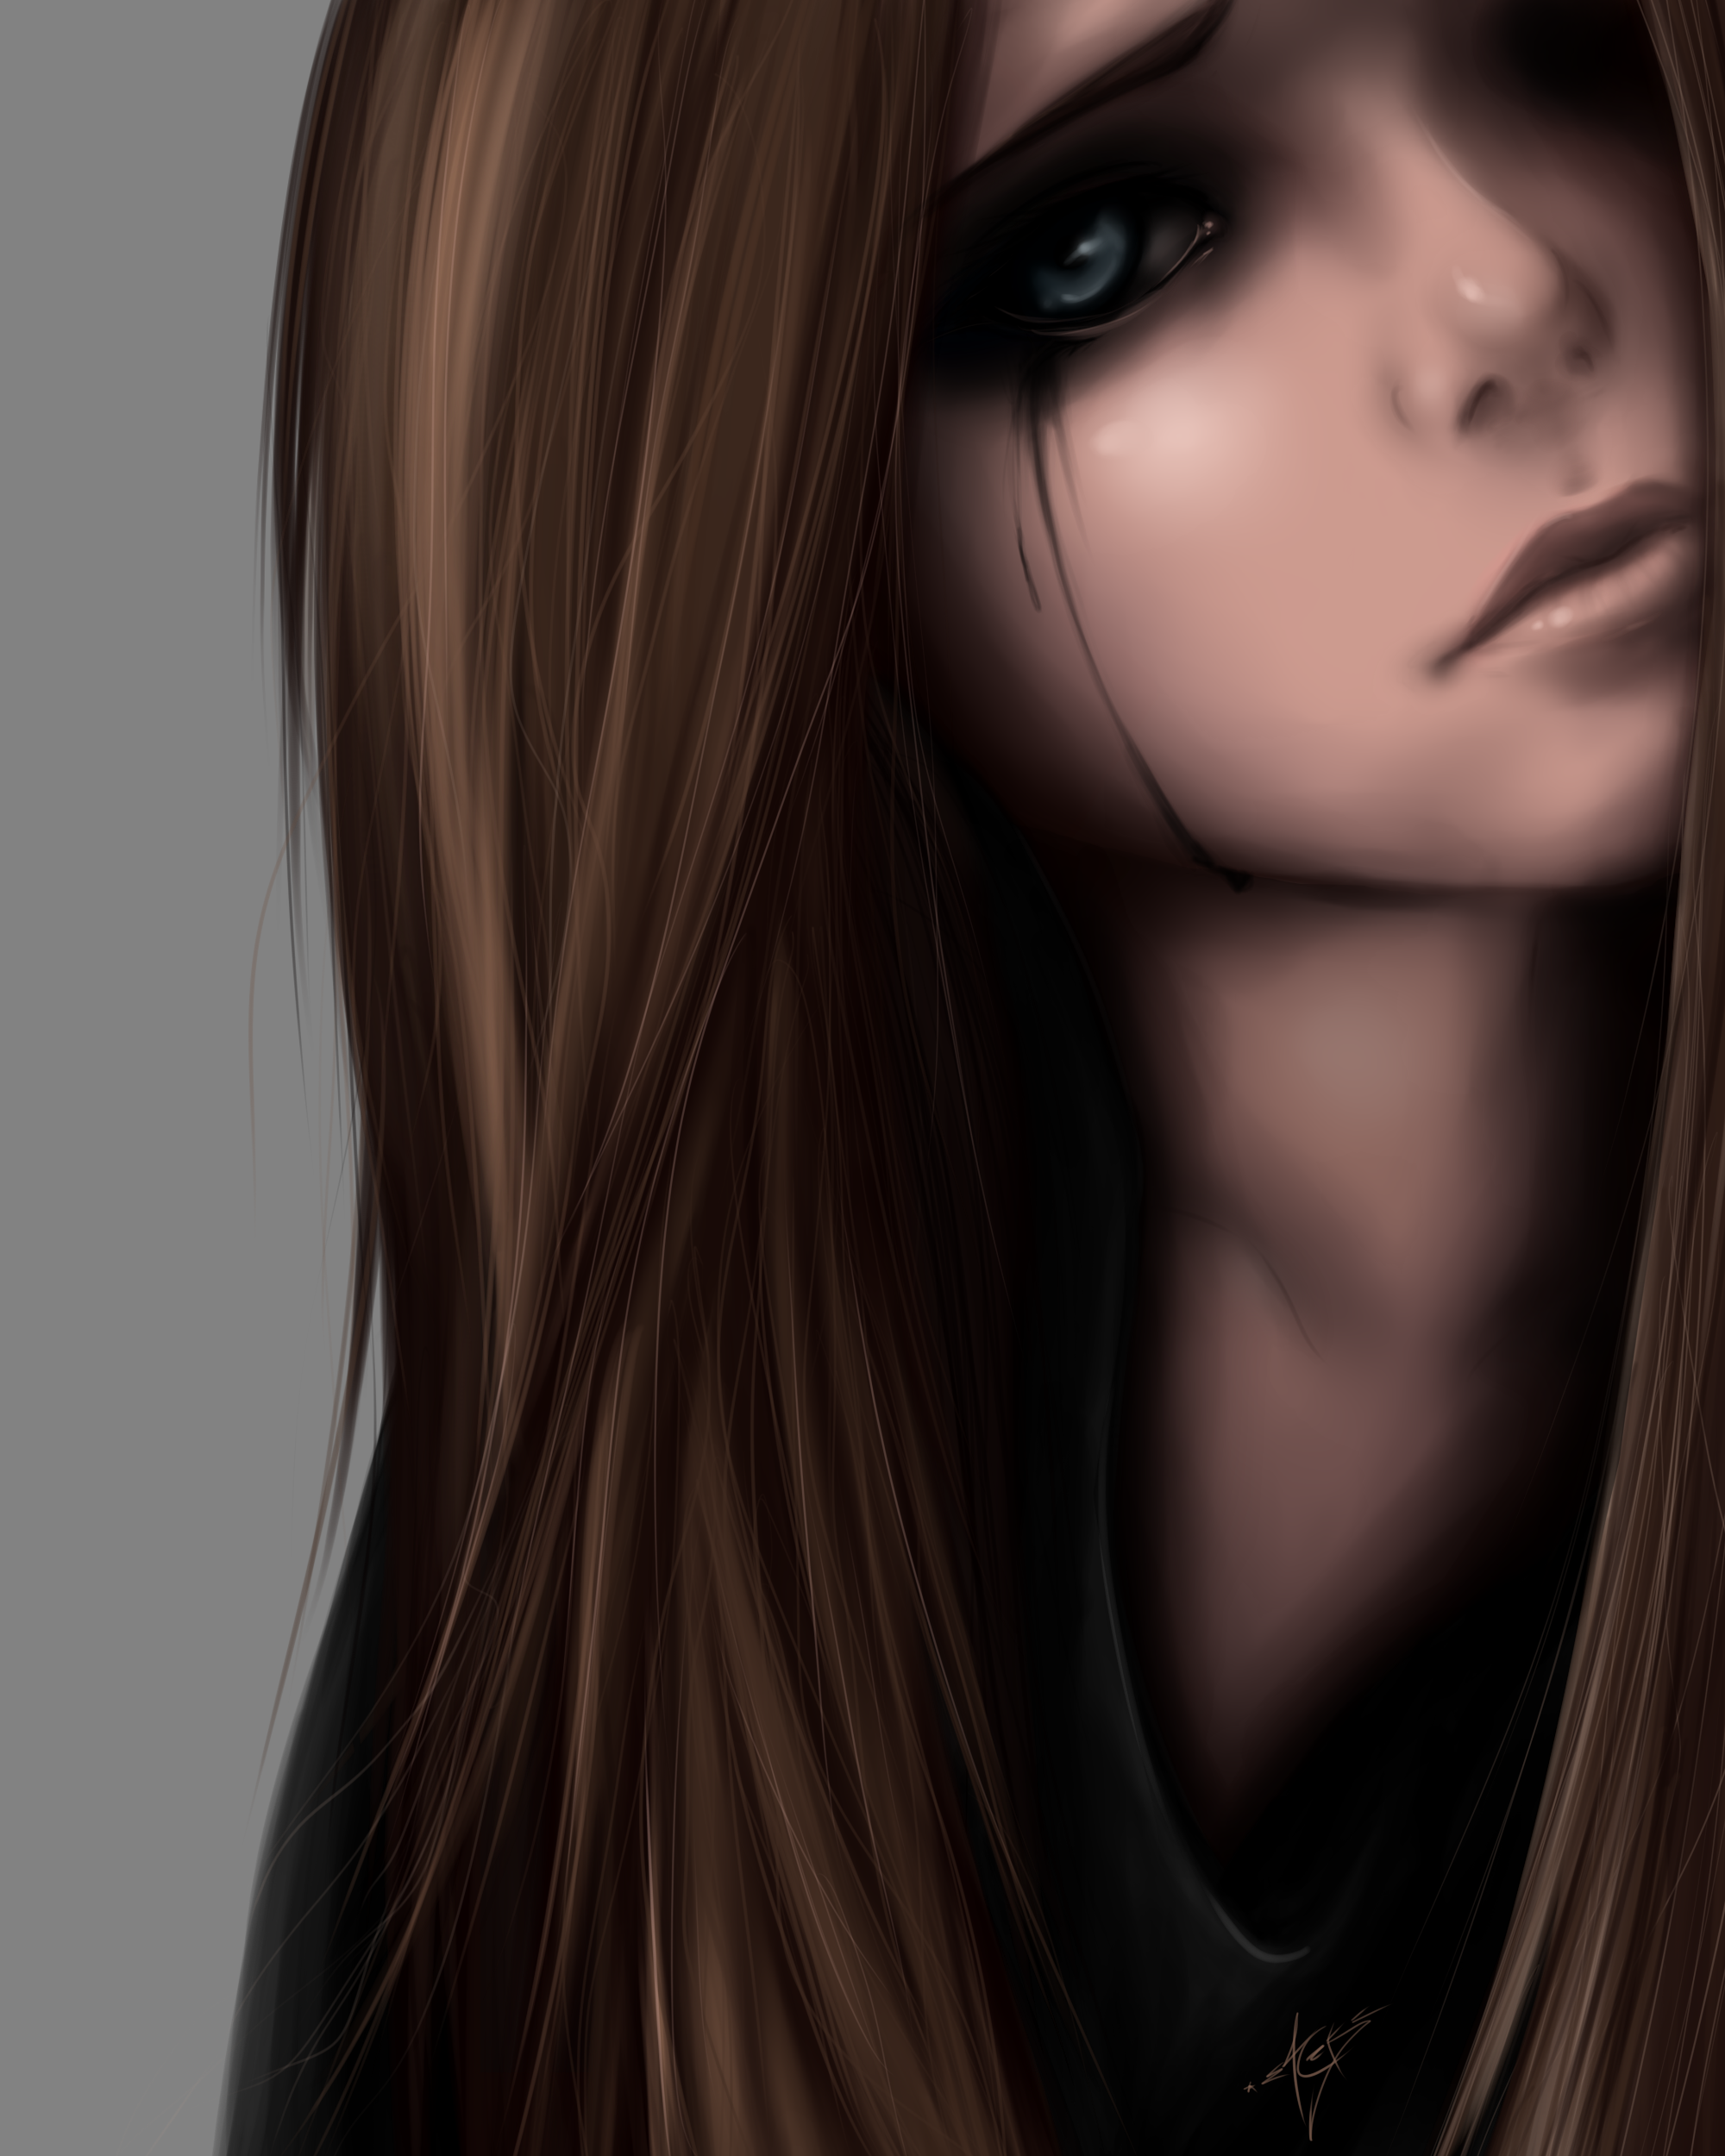 Sad girl by zackargunov on deviantart - Sad girl pictures crying ...